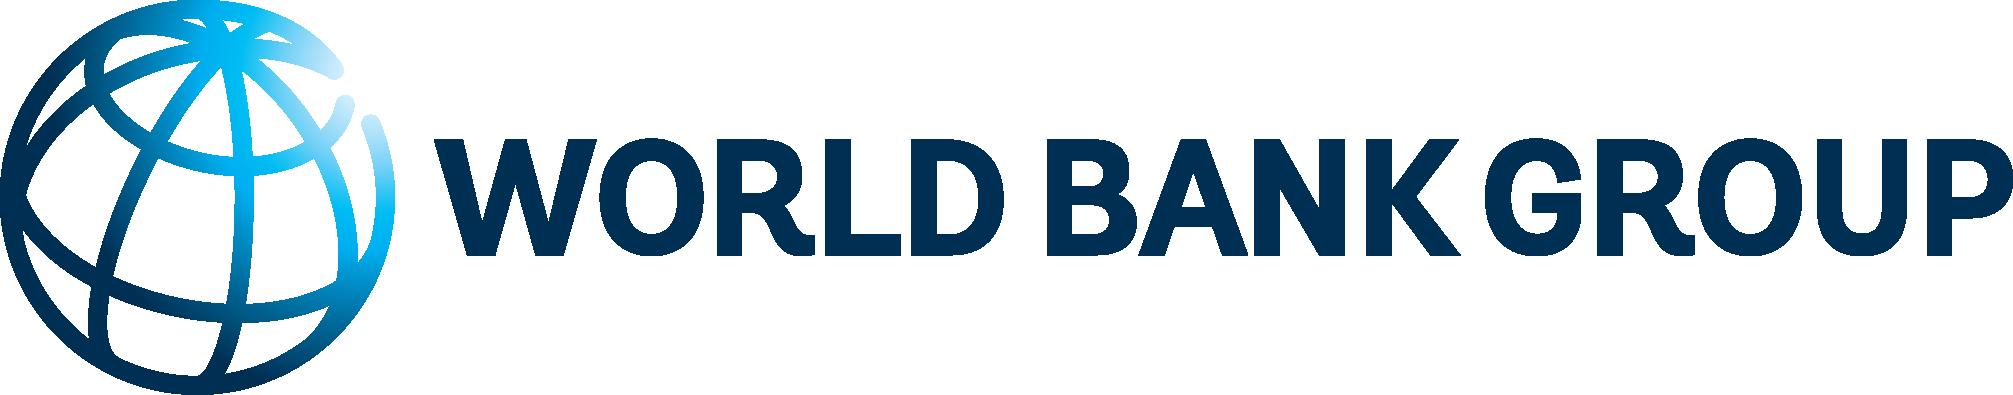 logo of Worldbank